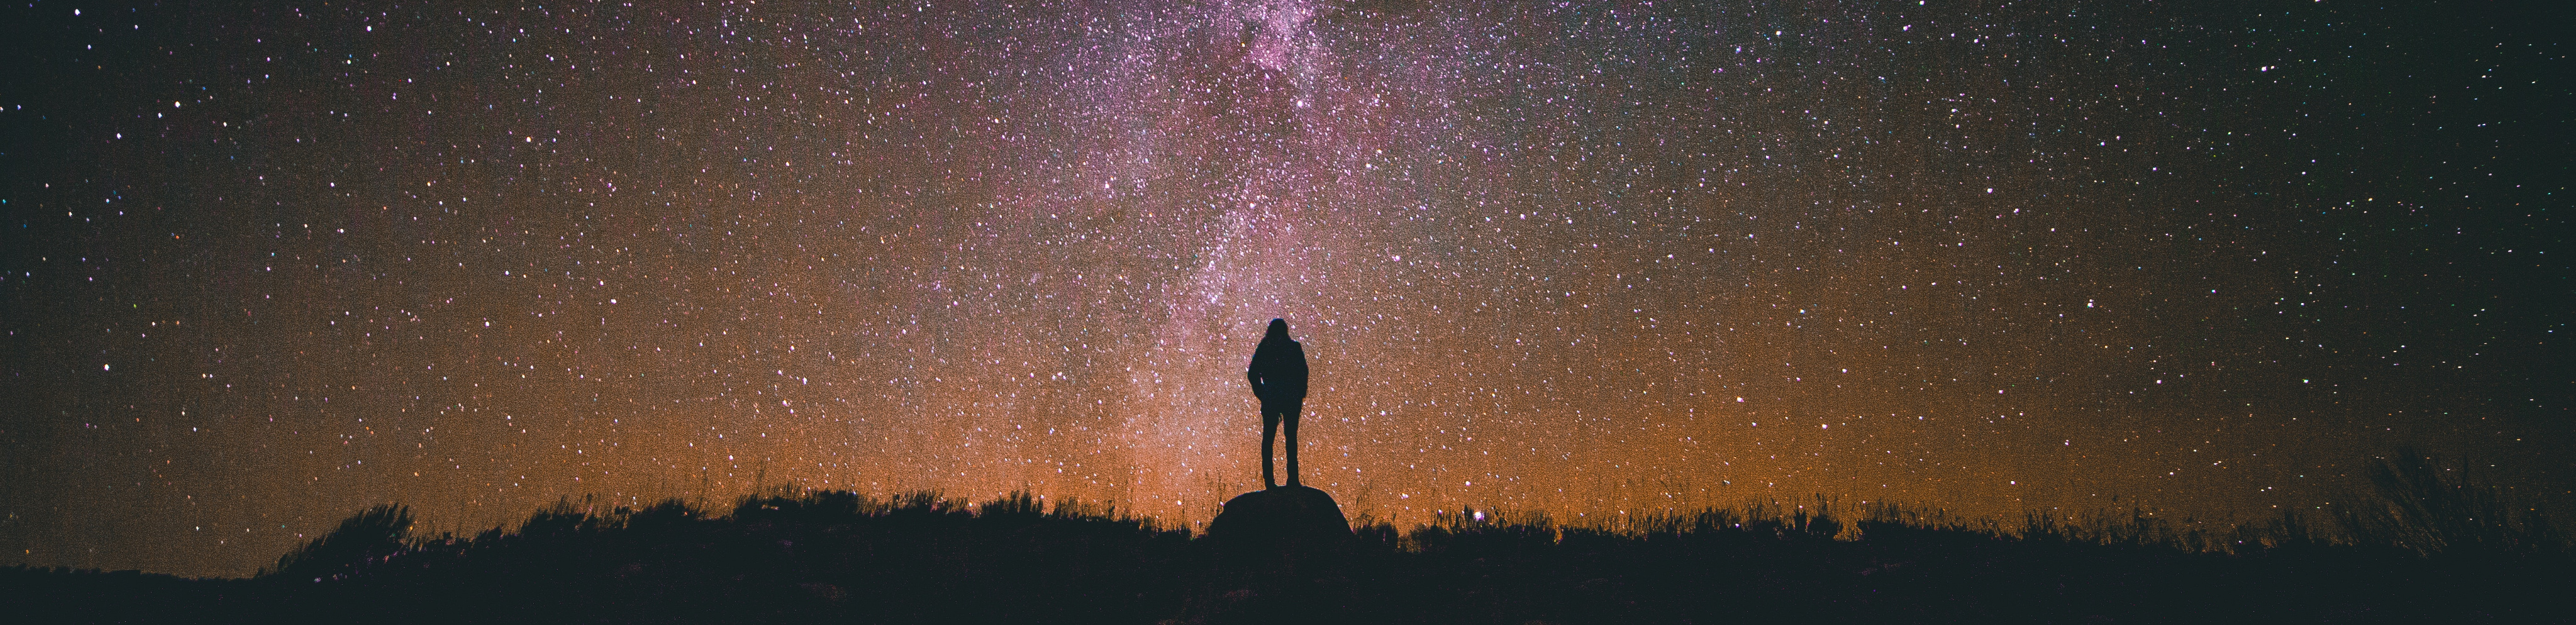 dark-galaxy-wallpaper-night-32237 (1)